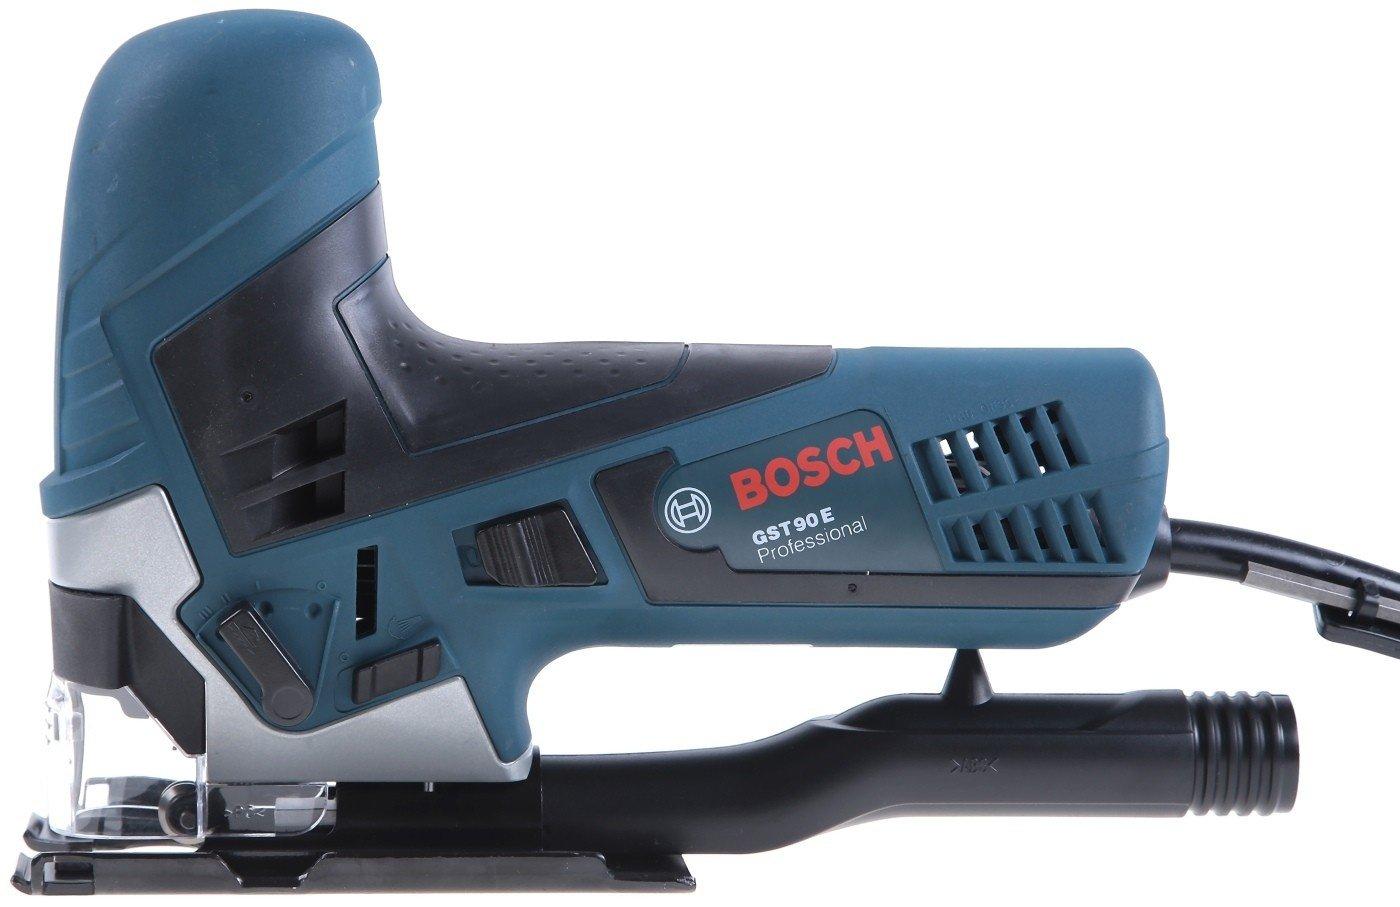 Электролобзик Bosch GST 90 E (060158G000) фото